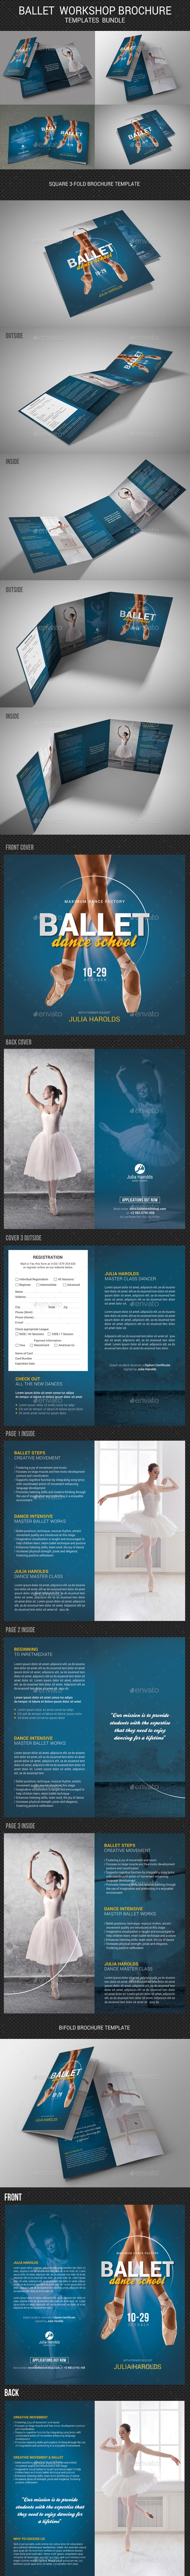 4 Ballet Workshop Brochure Bundle - Brochures Print Templates